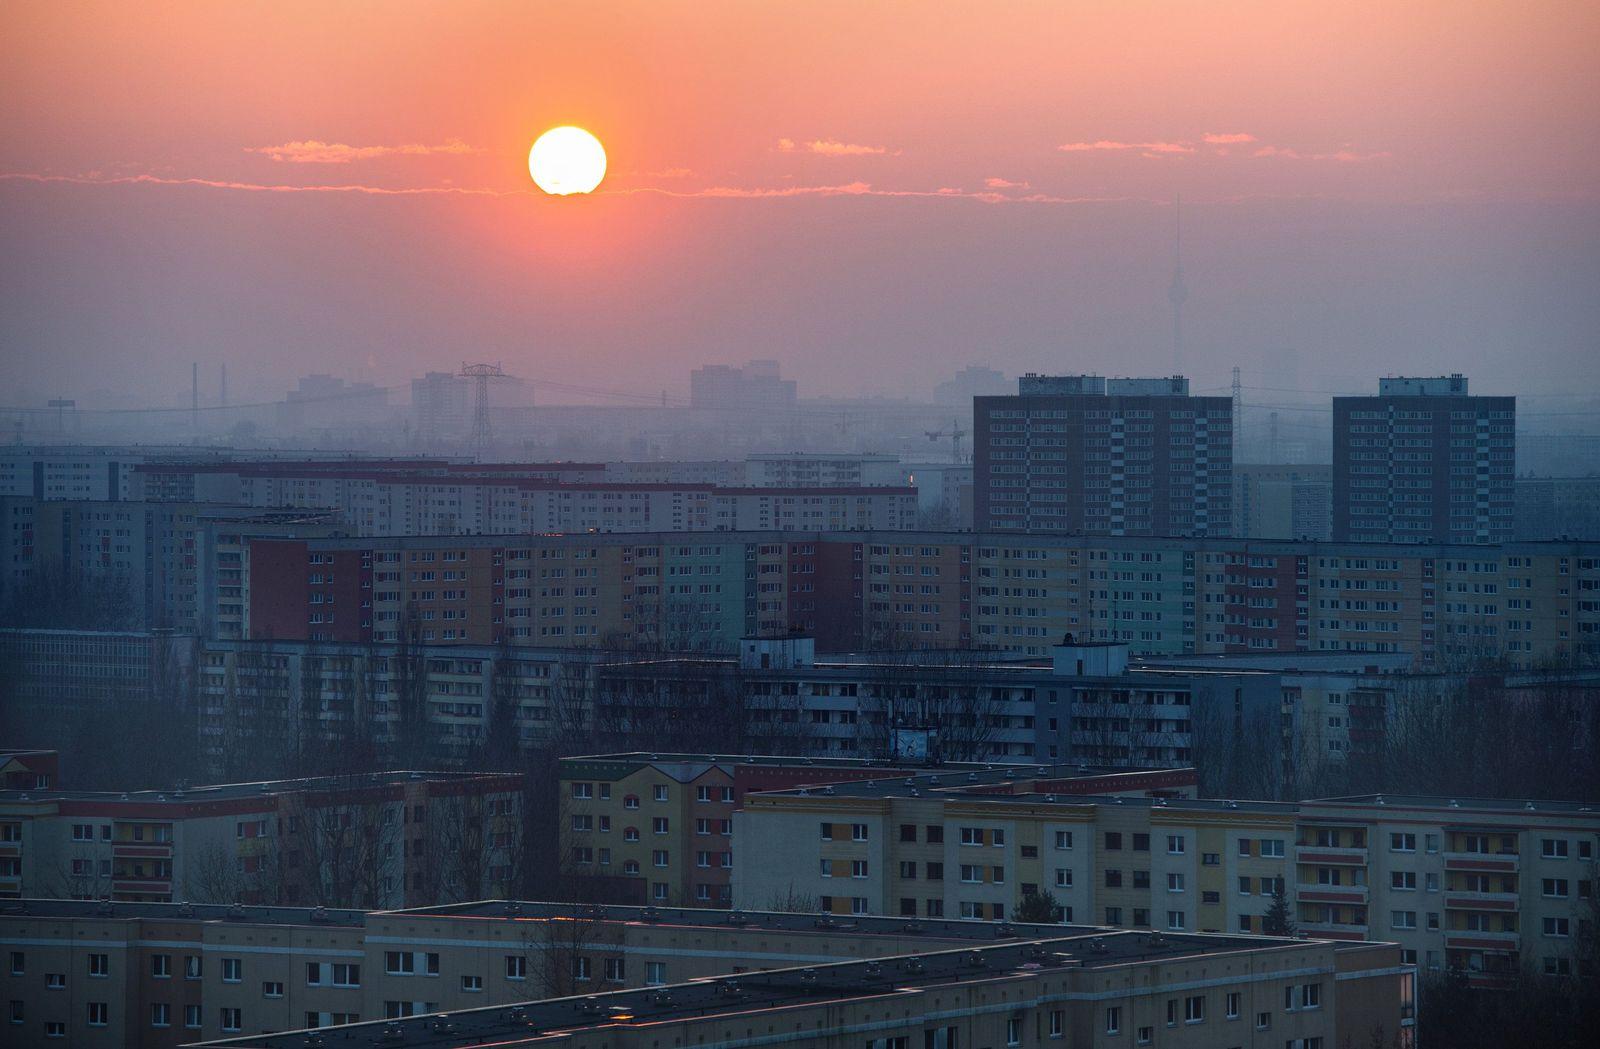 Sonnenuntergang über Berlin